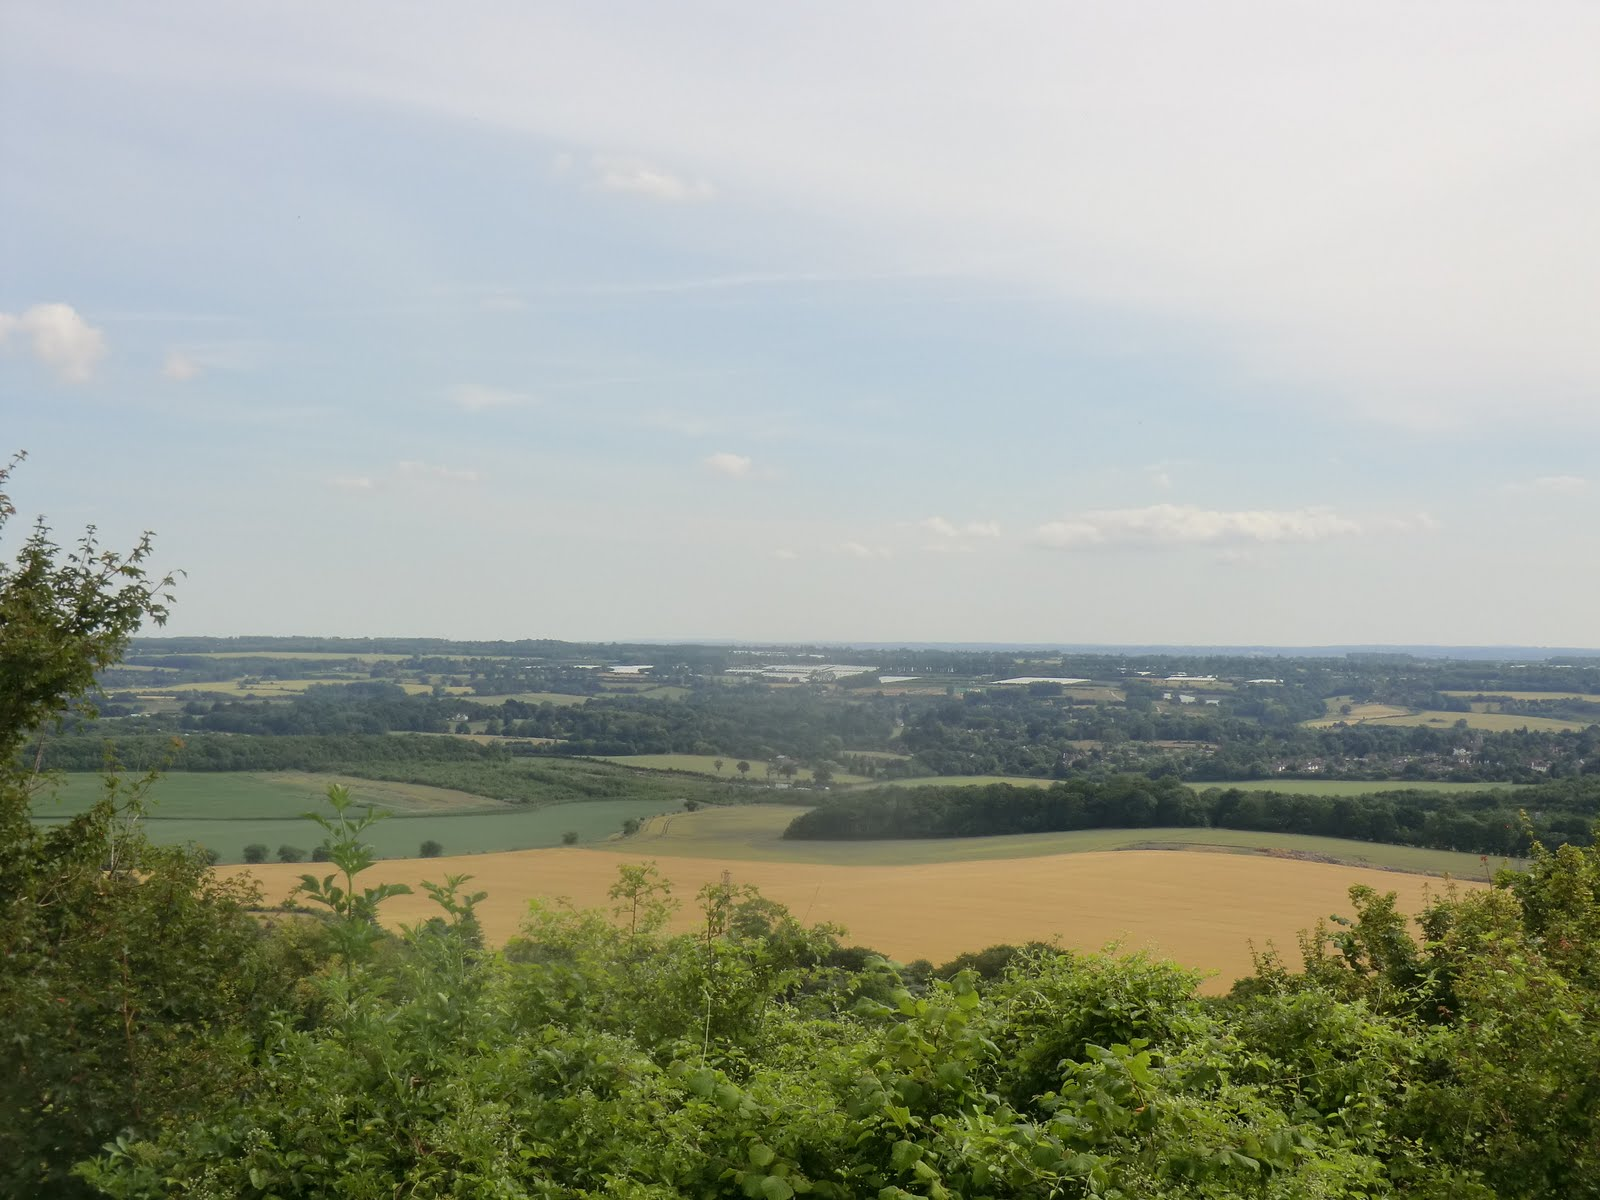 CIMG2400 View from Thurnham Castle